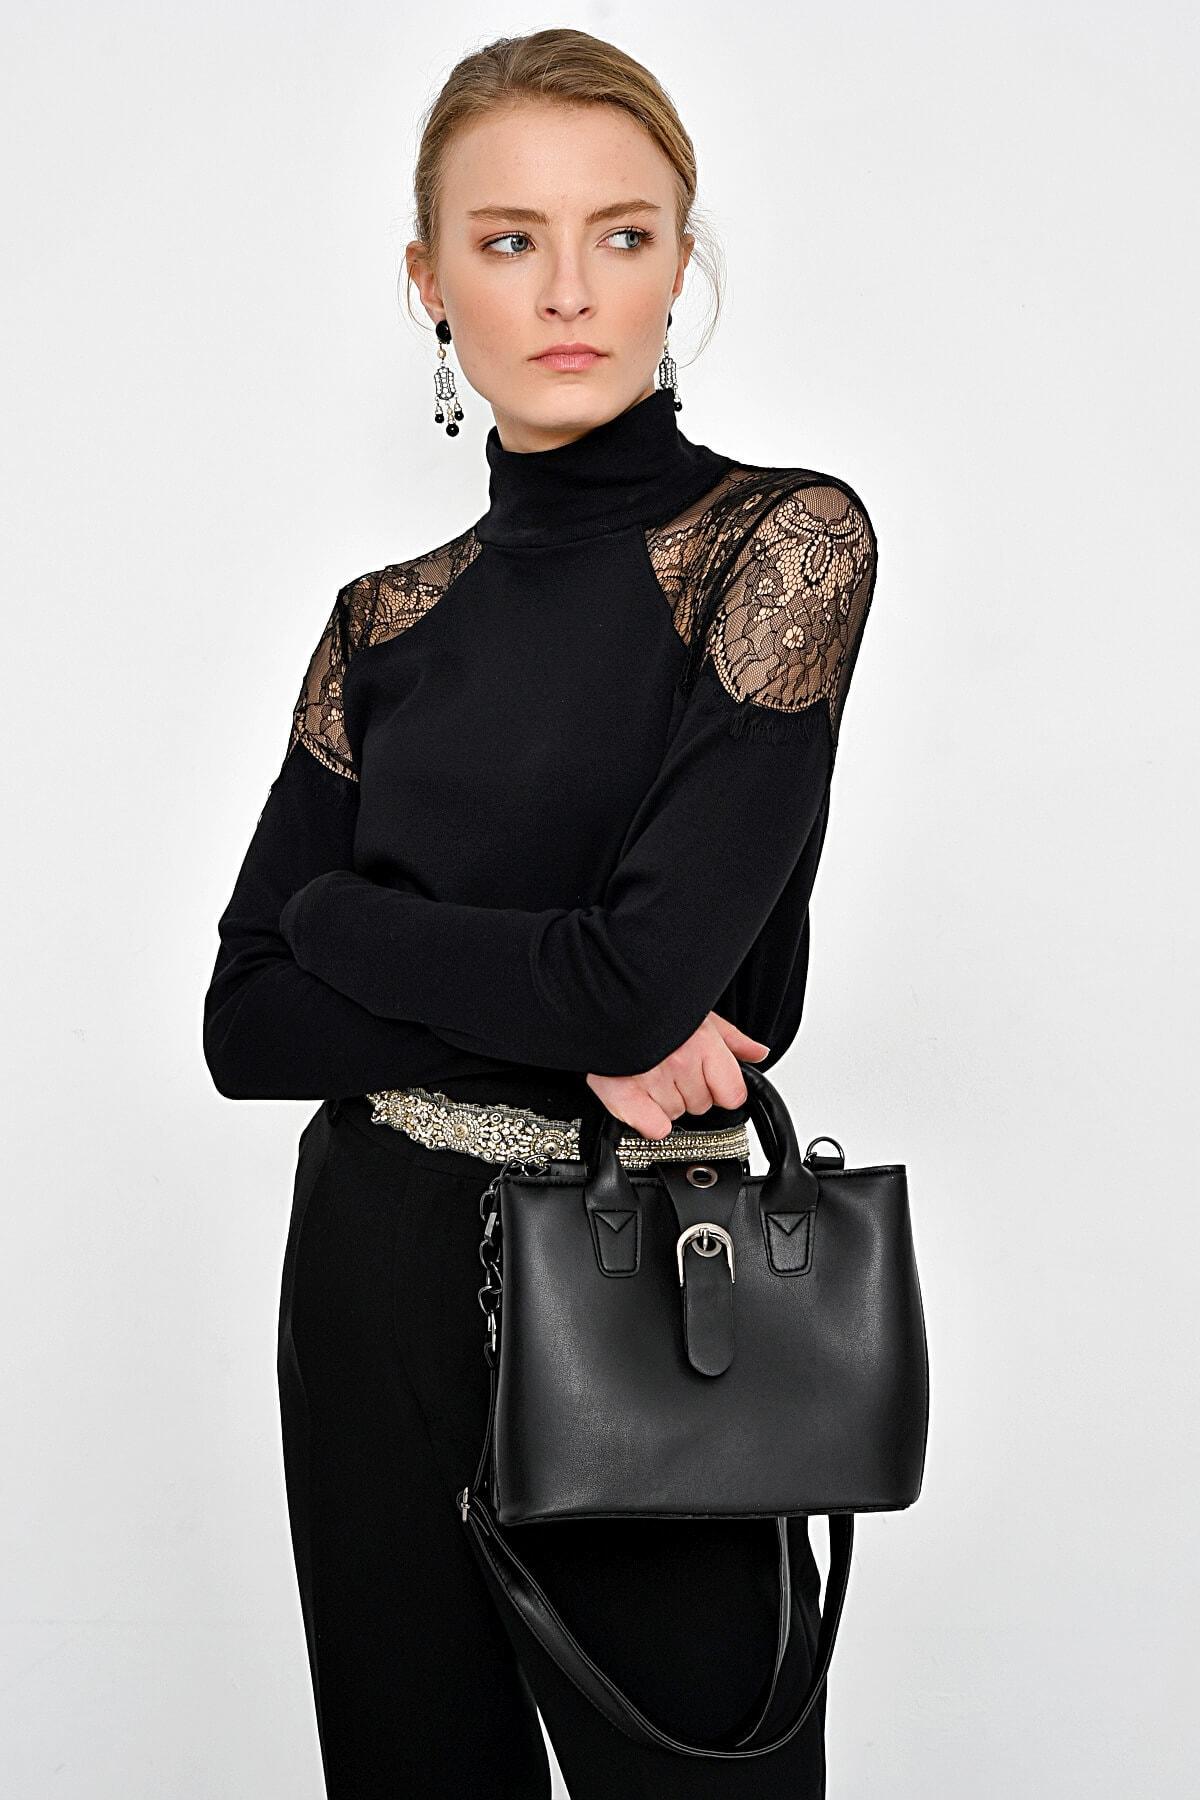 Hanna's by Hanna Darsa Kadın Siyah Omuzları Dantelli Bluz HN2364 1